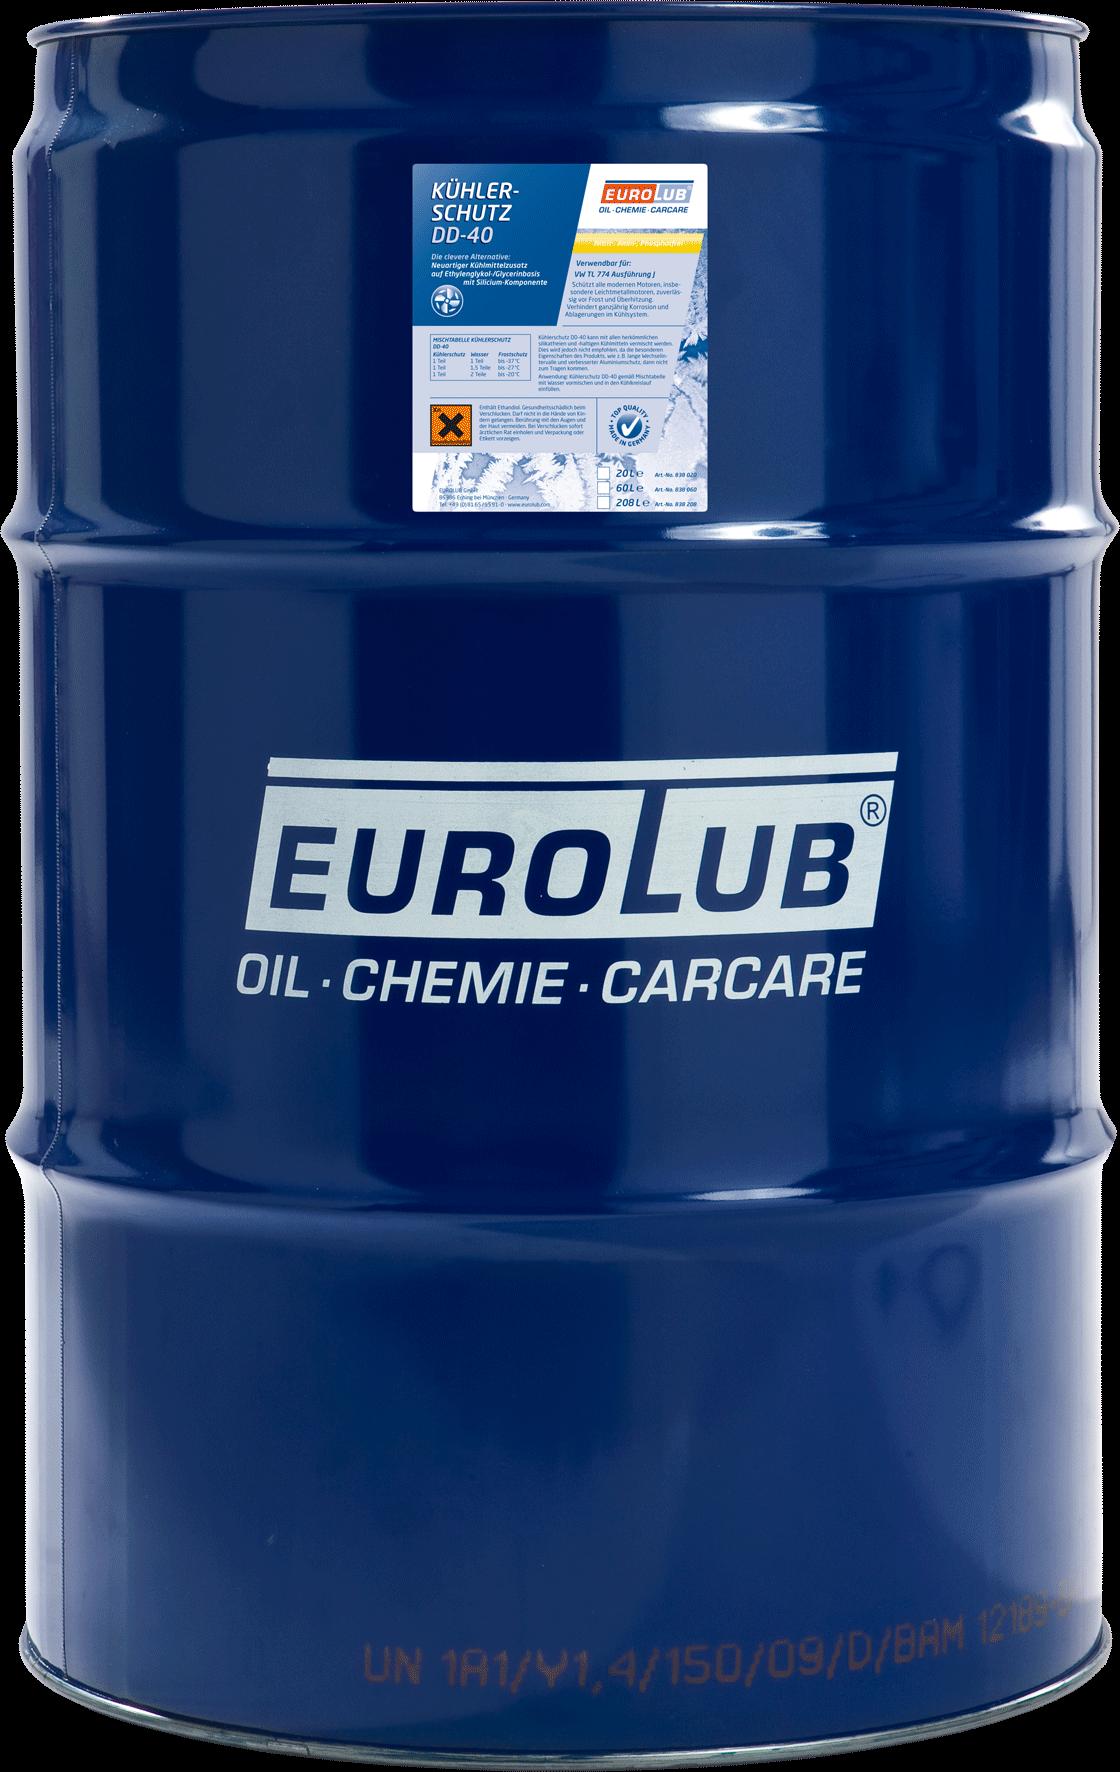 Антифриз EUROLUB Kuhlerschutz  DD-40